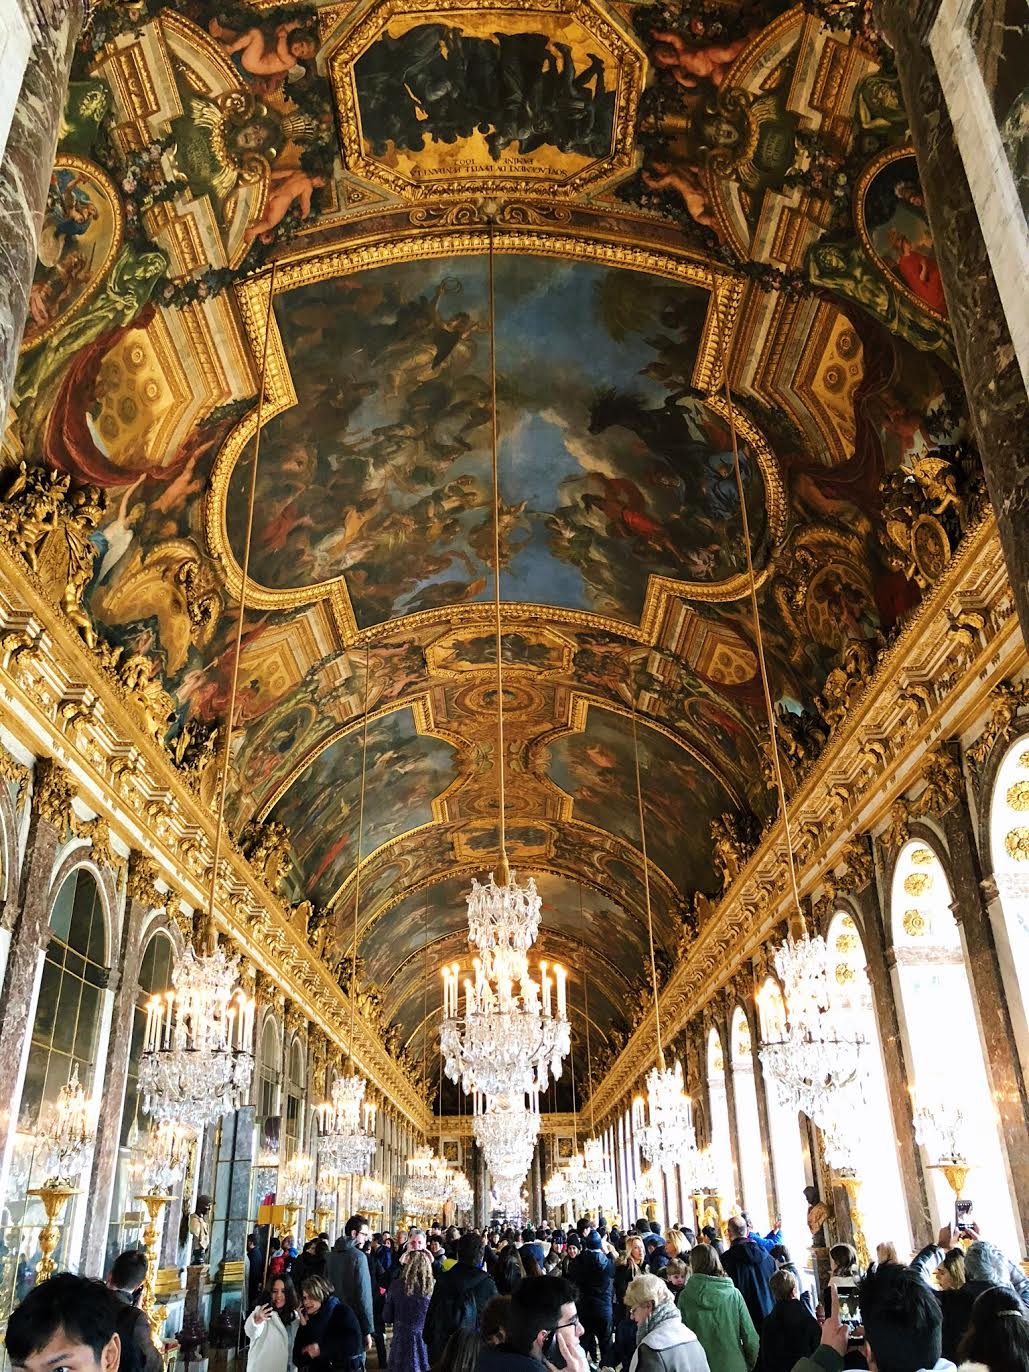 Muslim-travel-guide-Paris-Palace-of-Versailles-Hall-of-Mirrors.jpg